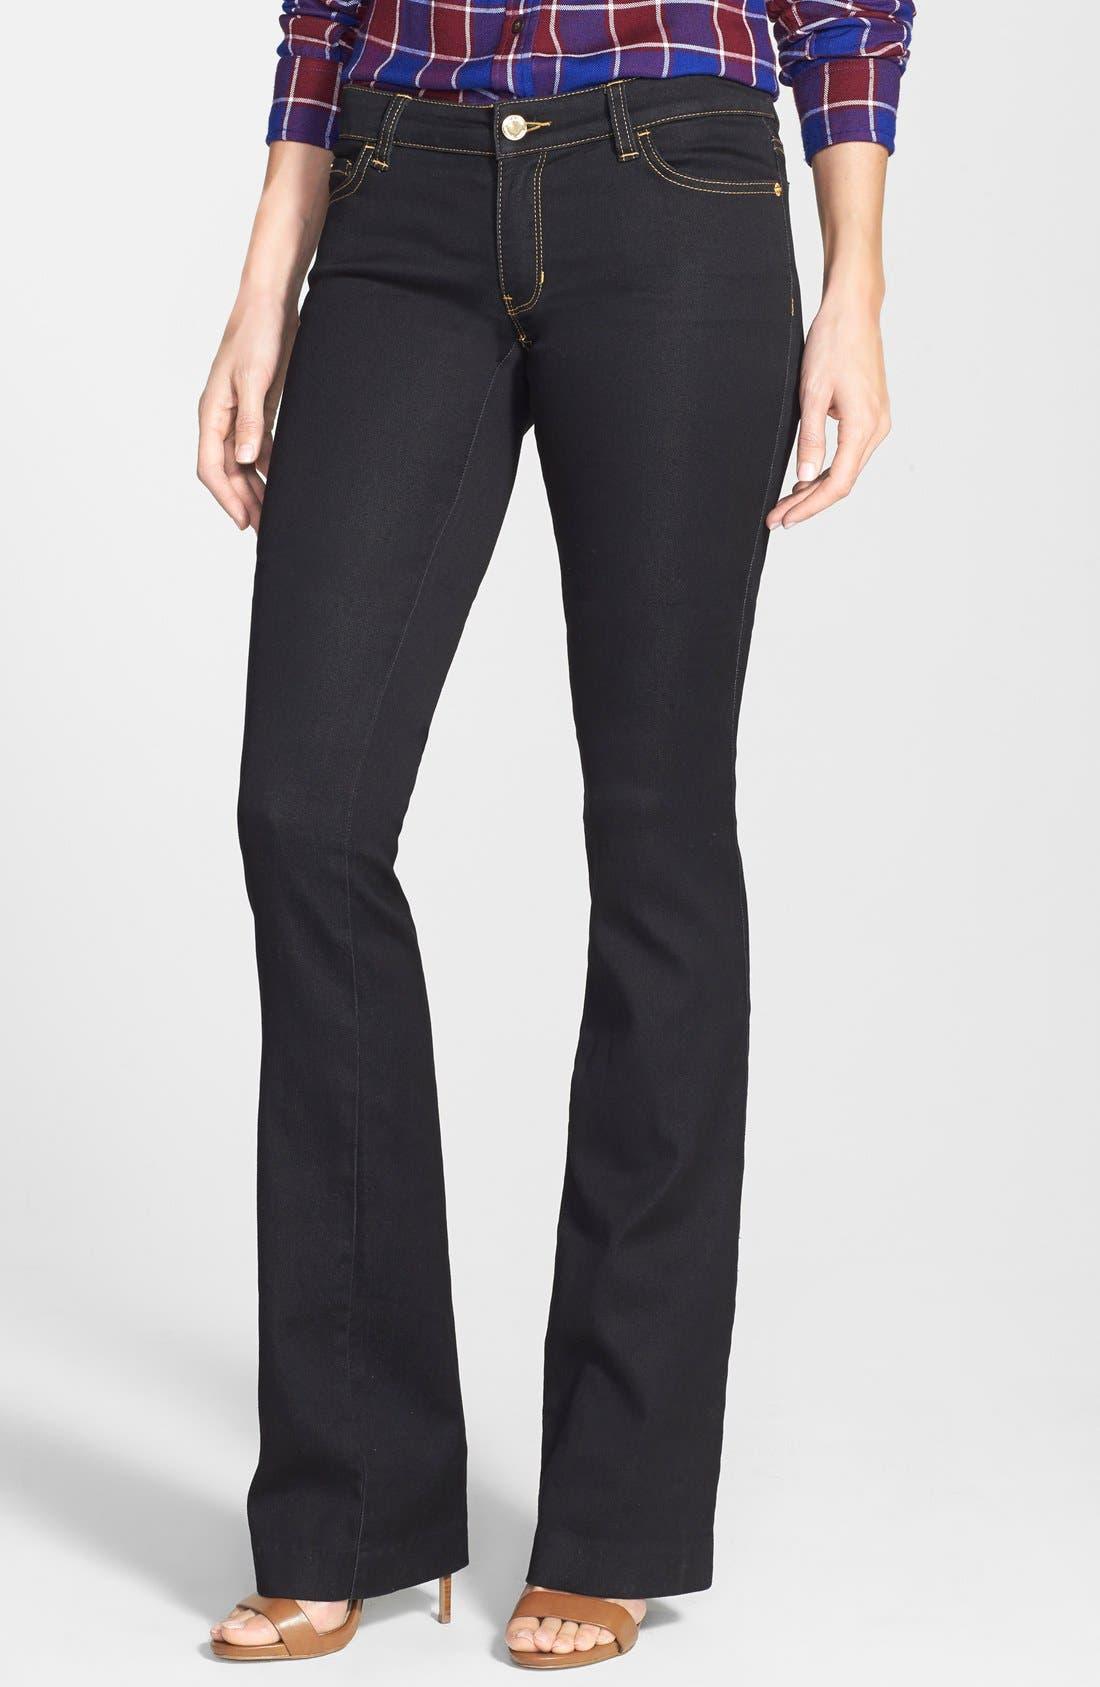 Alternate Image 1 Selected - MICHAEL Michael Kors Stretch Straight Leg Jeans